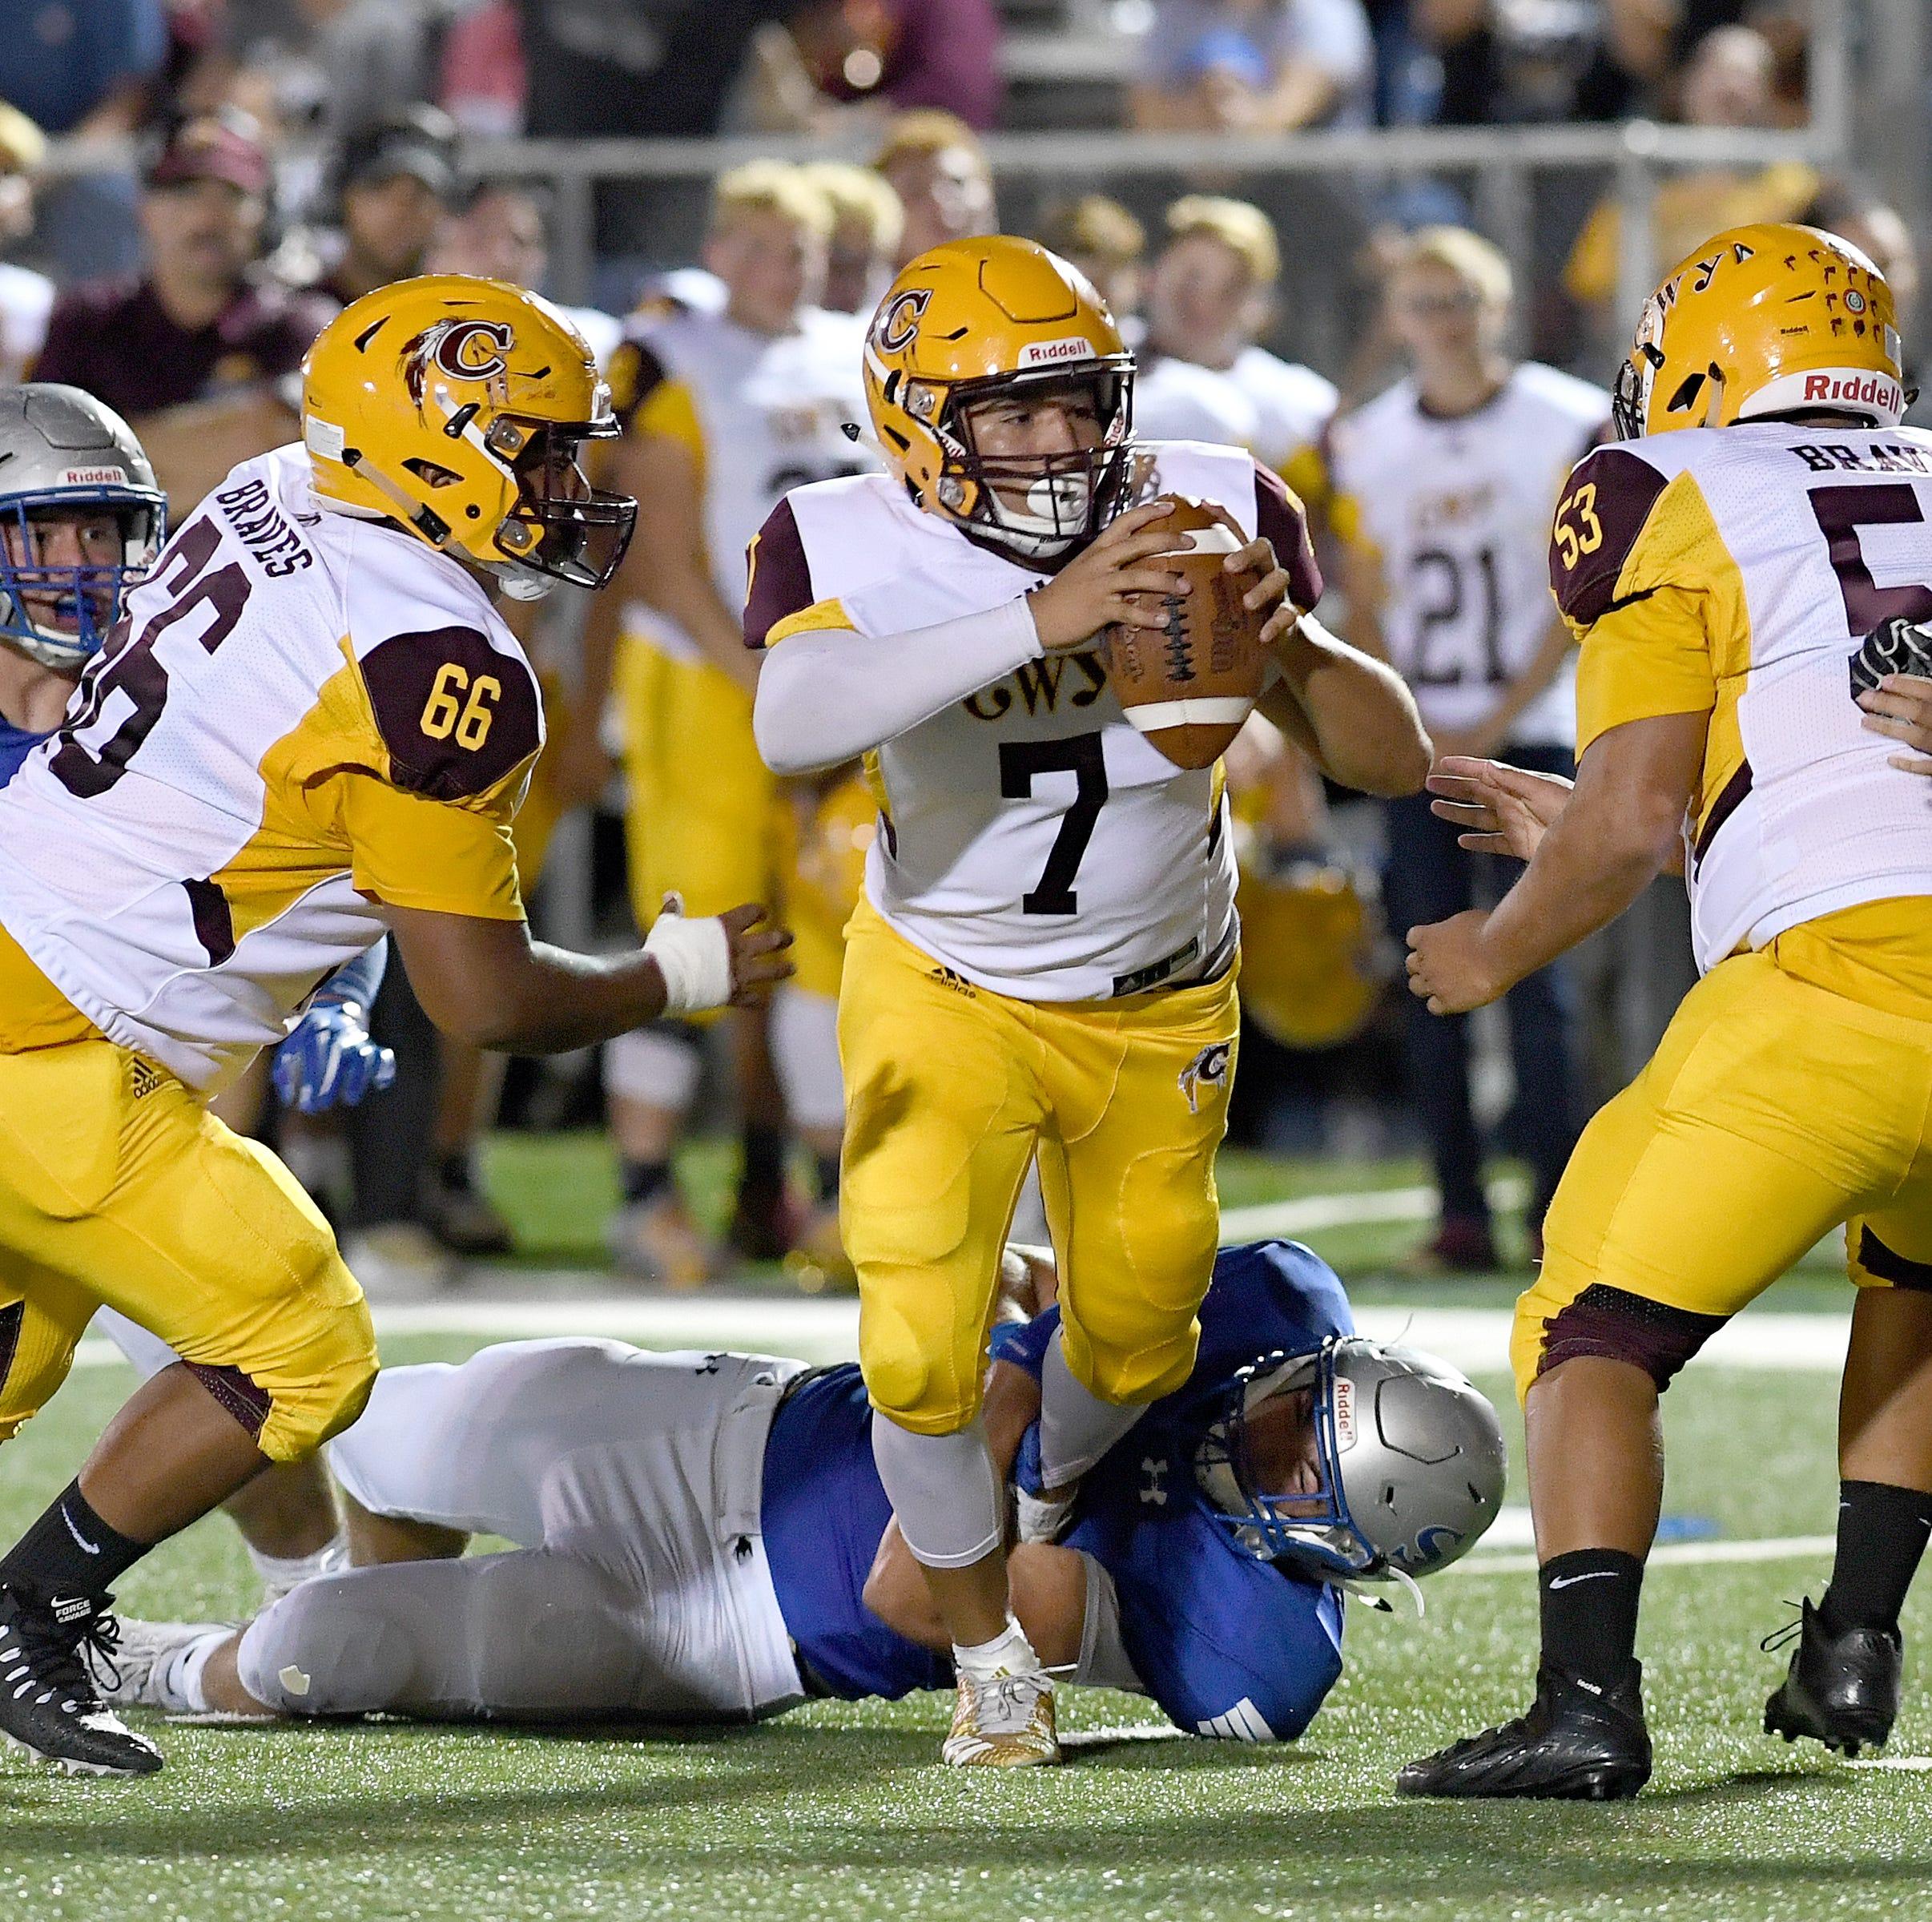 WNC high school football: First-round playoff storylines